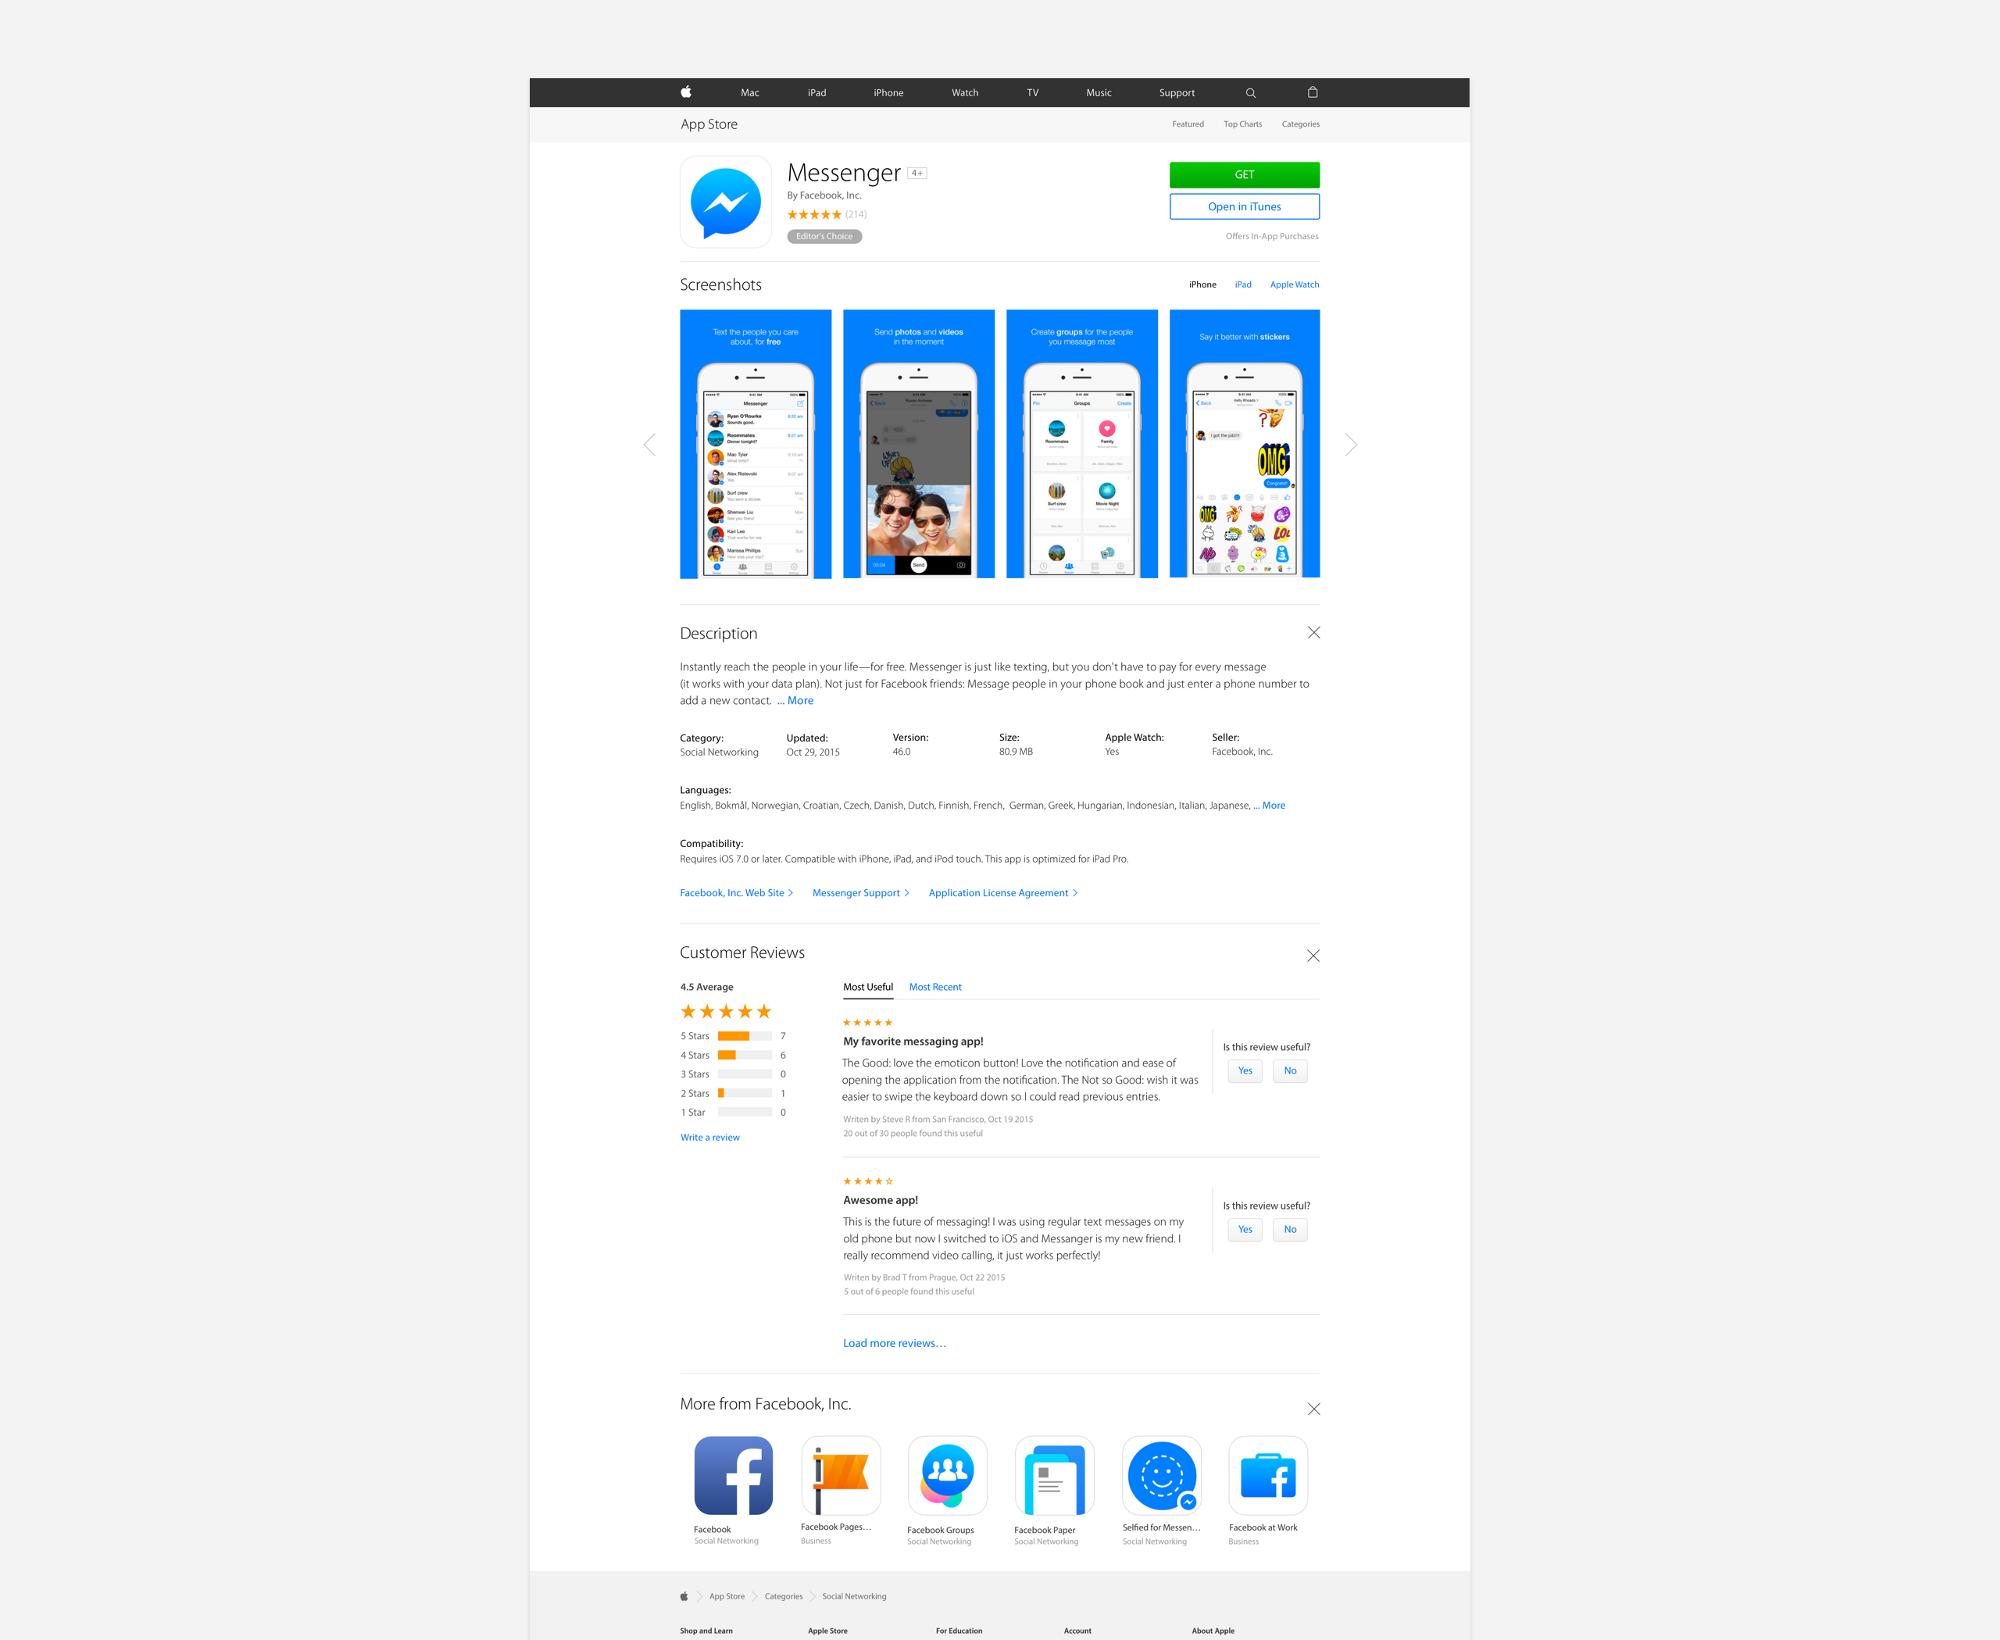 App Store в вебе